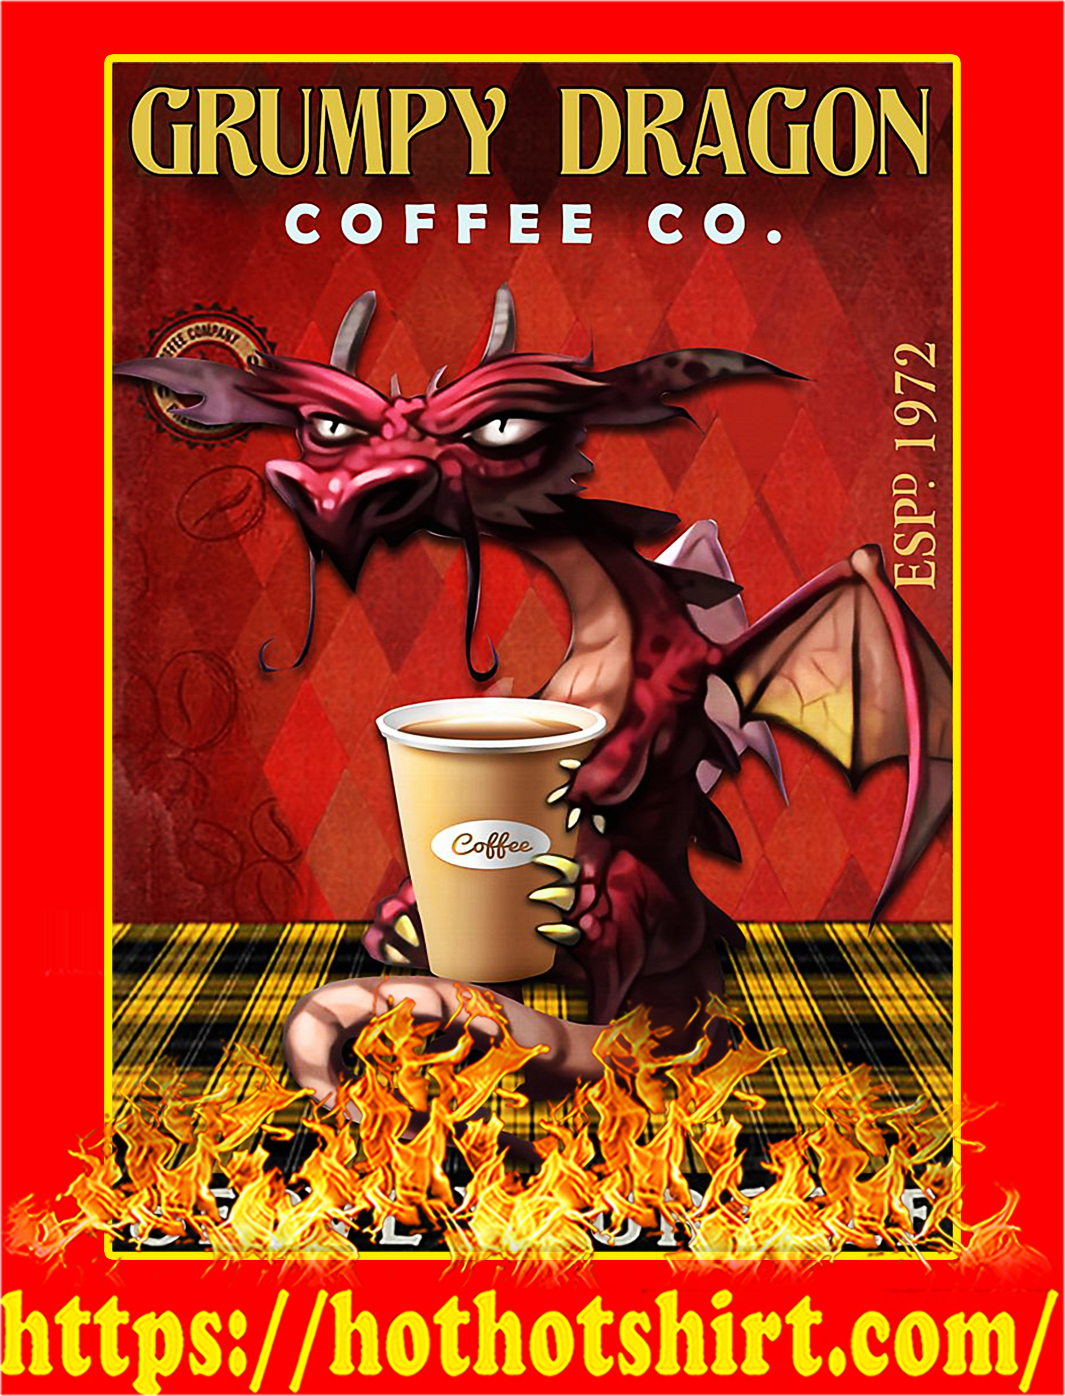 Grumpy Dragon Coffee Co Poster - A3